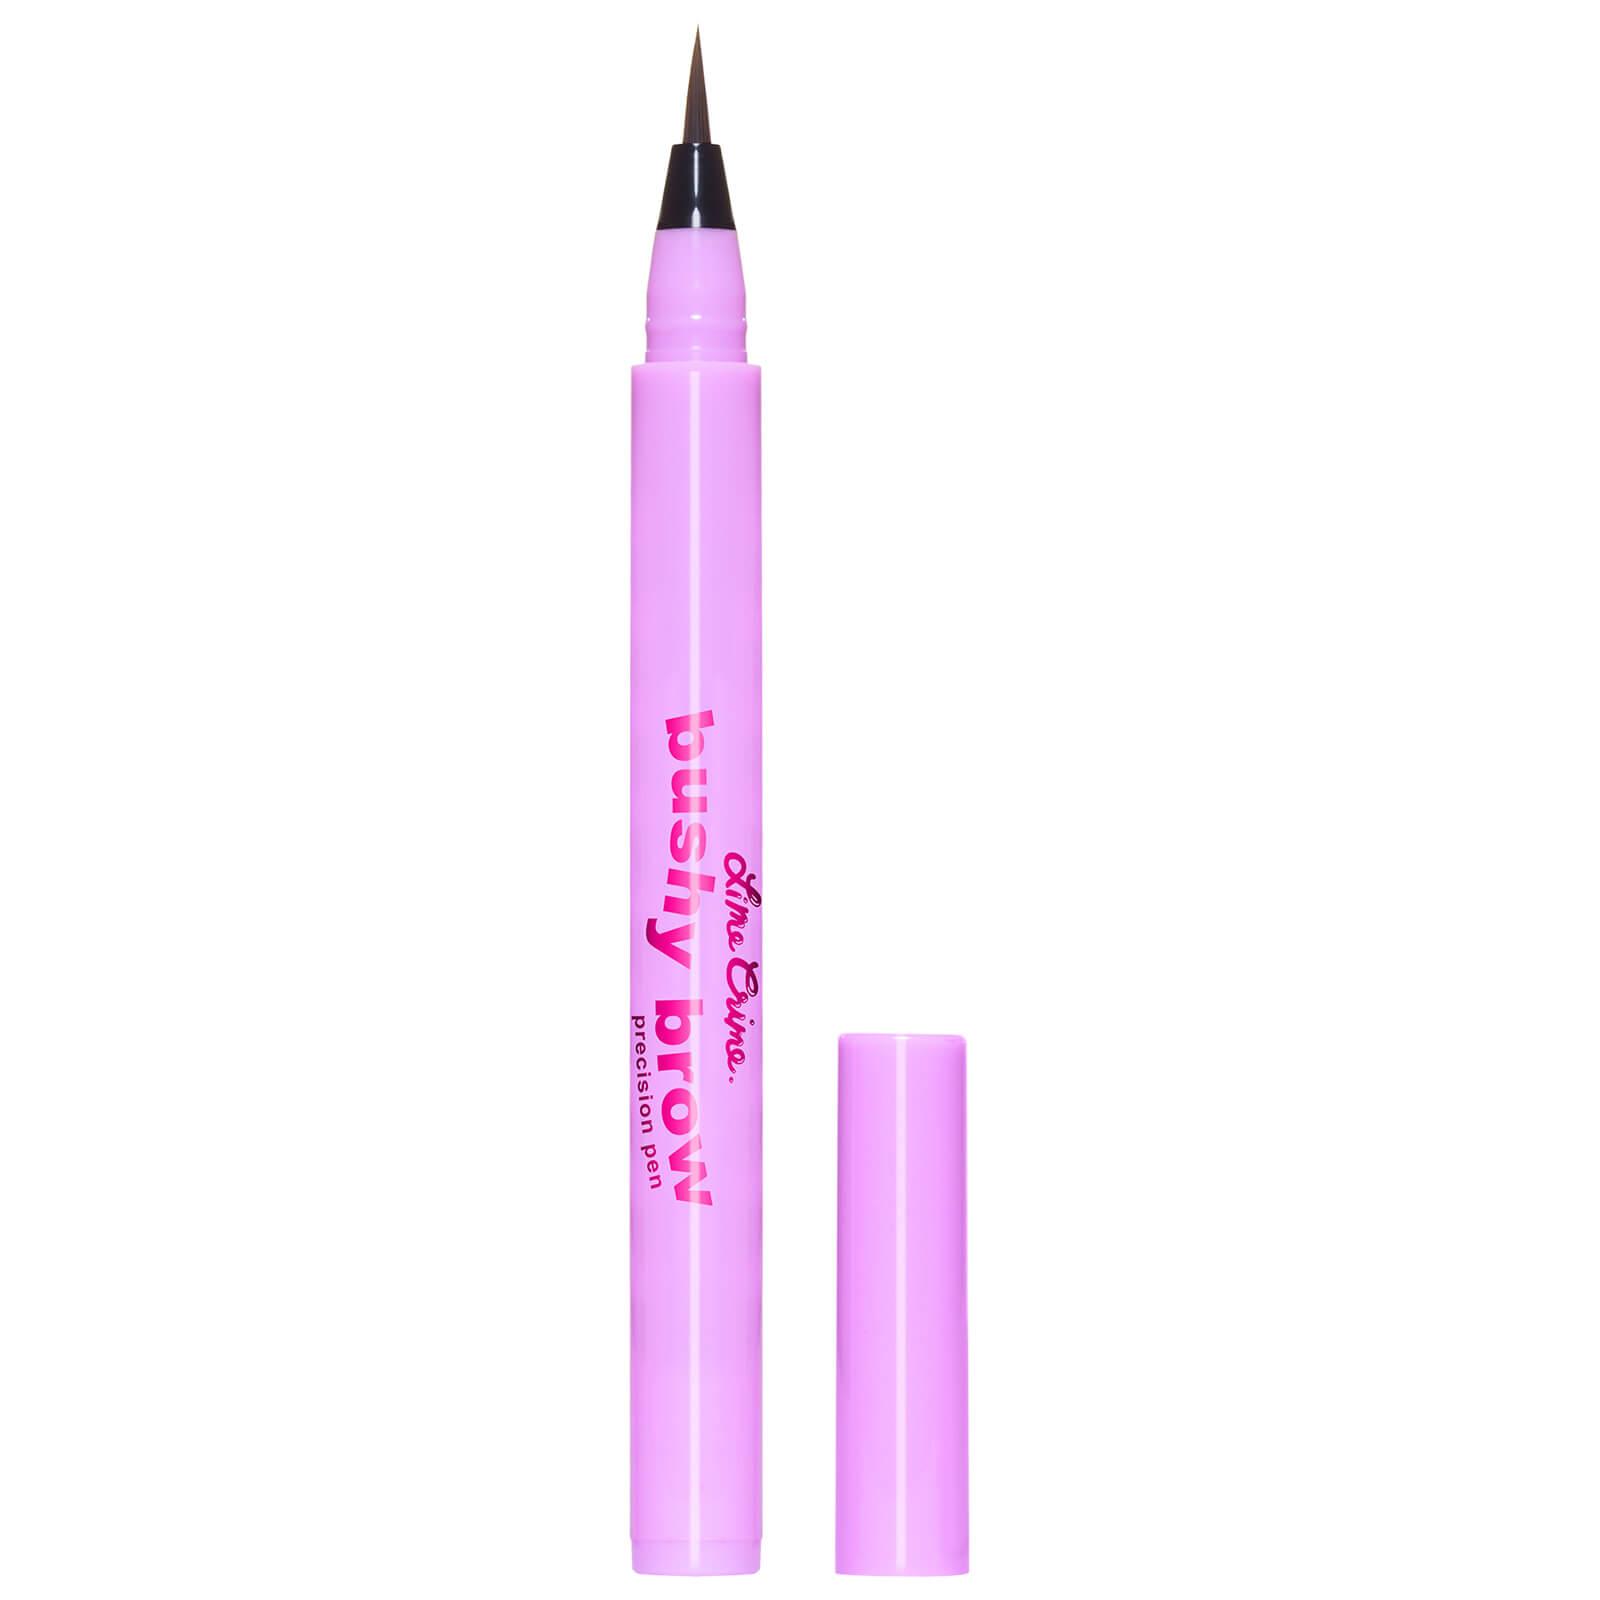 Lime Crime Bushy Brow Pen 0.7ml (Various Shades) - Baby Brown